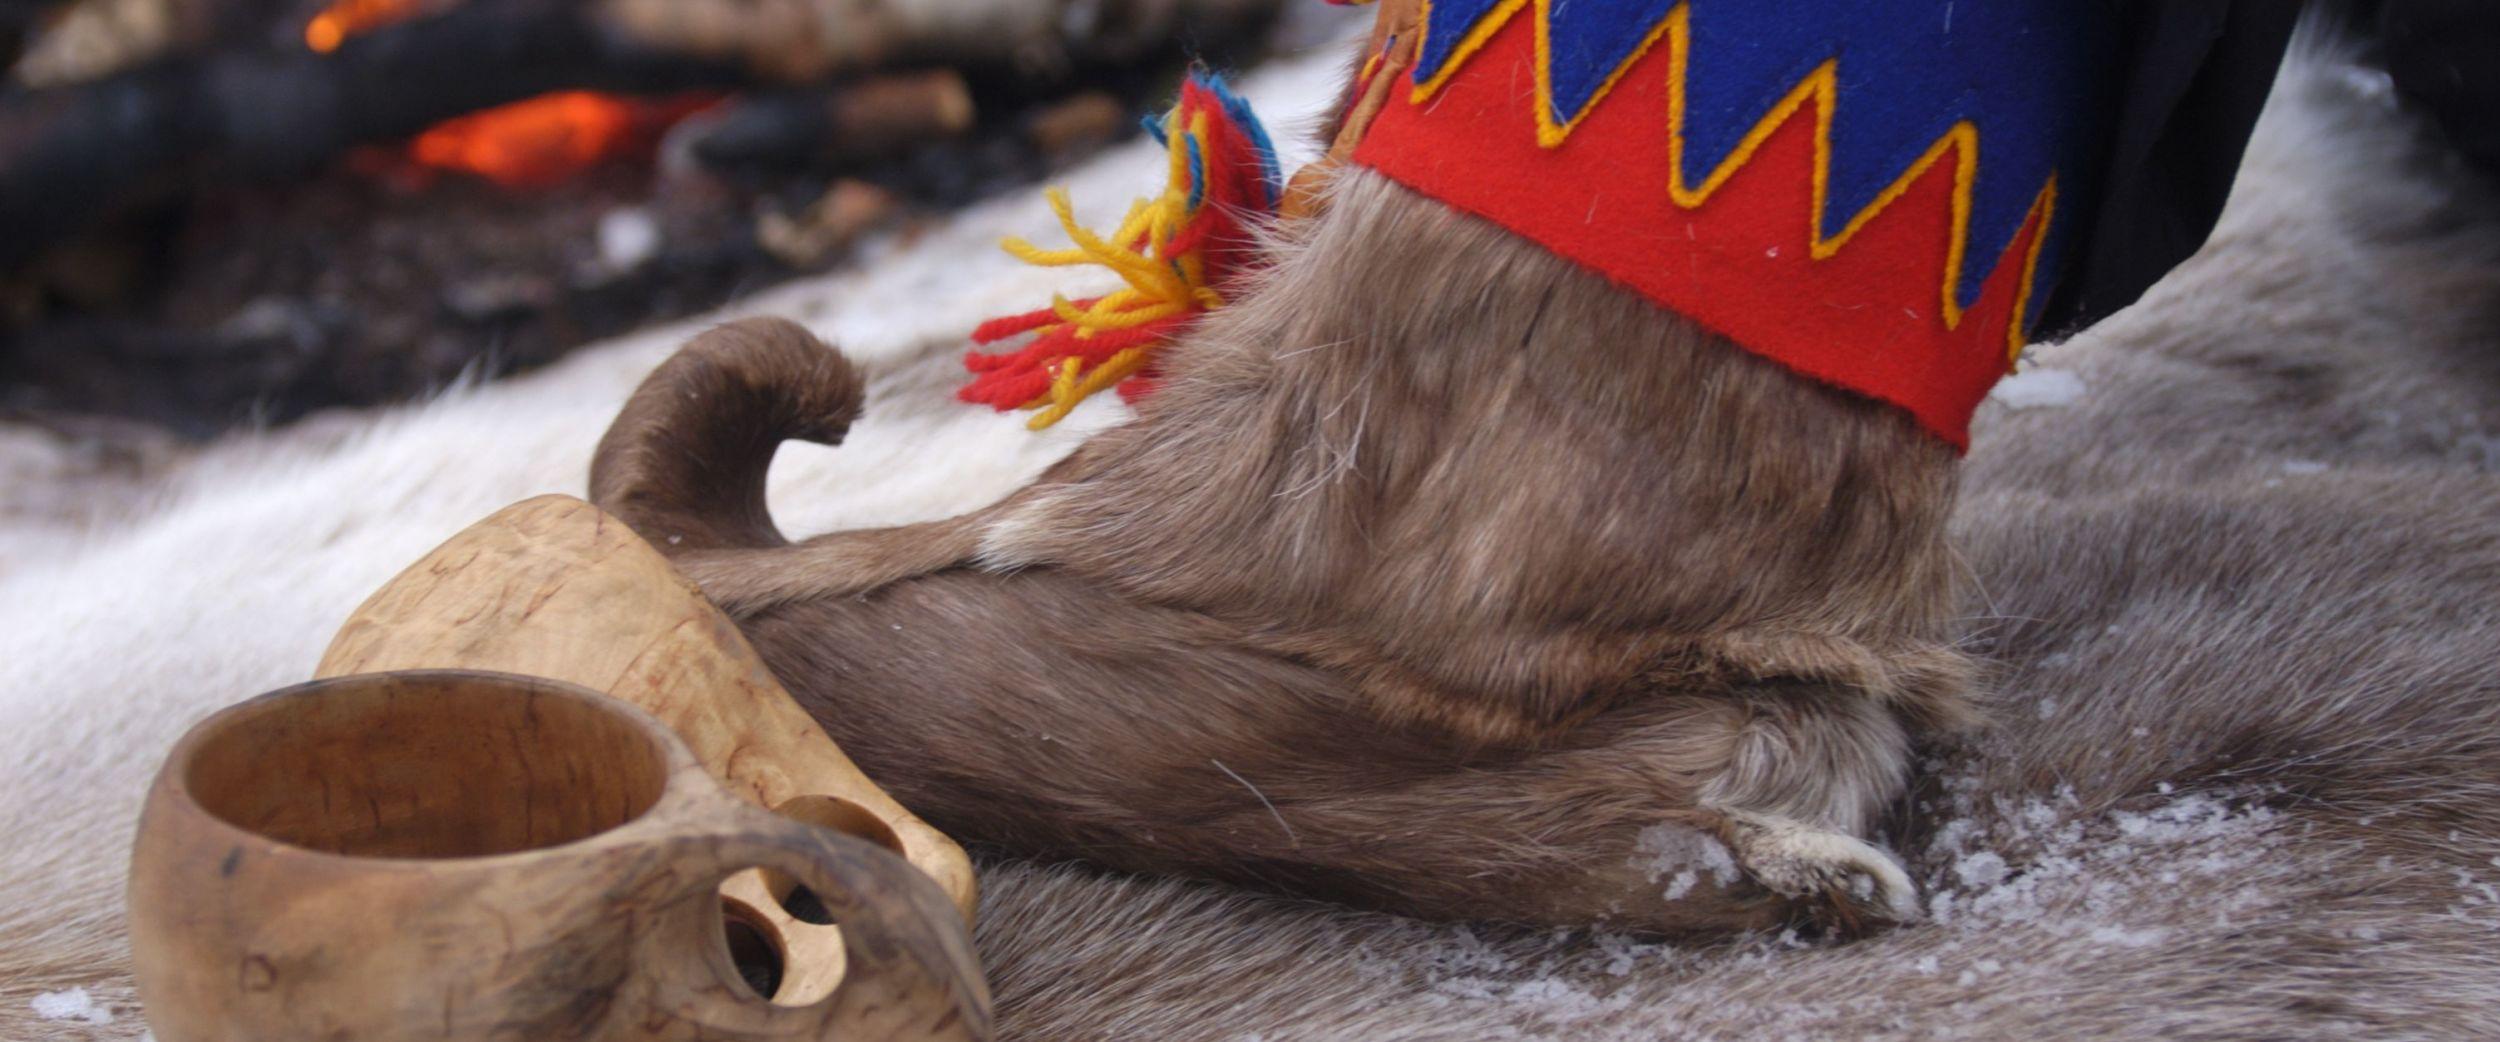 Sami arts and crafts, duodji. Photo: Trym Ivar Bergsmo, nordnorge.com